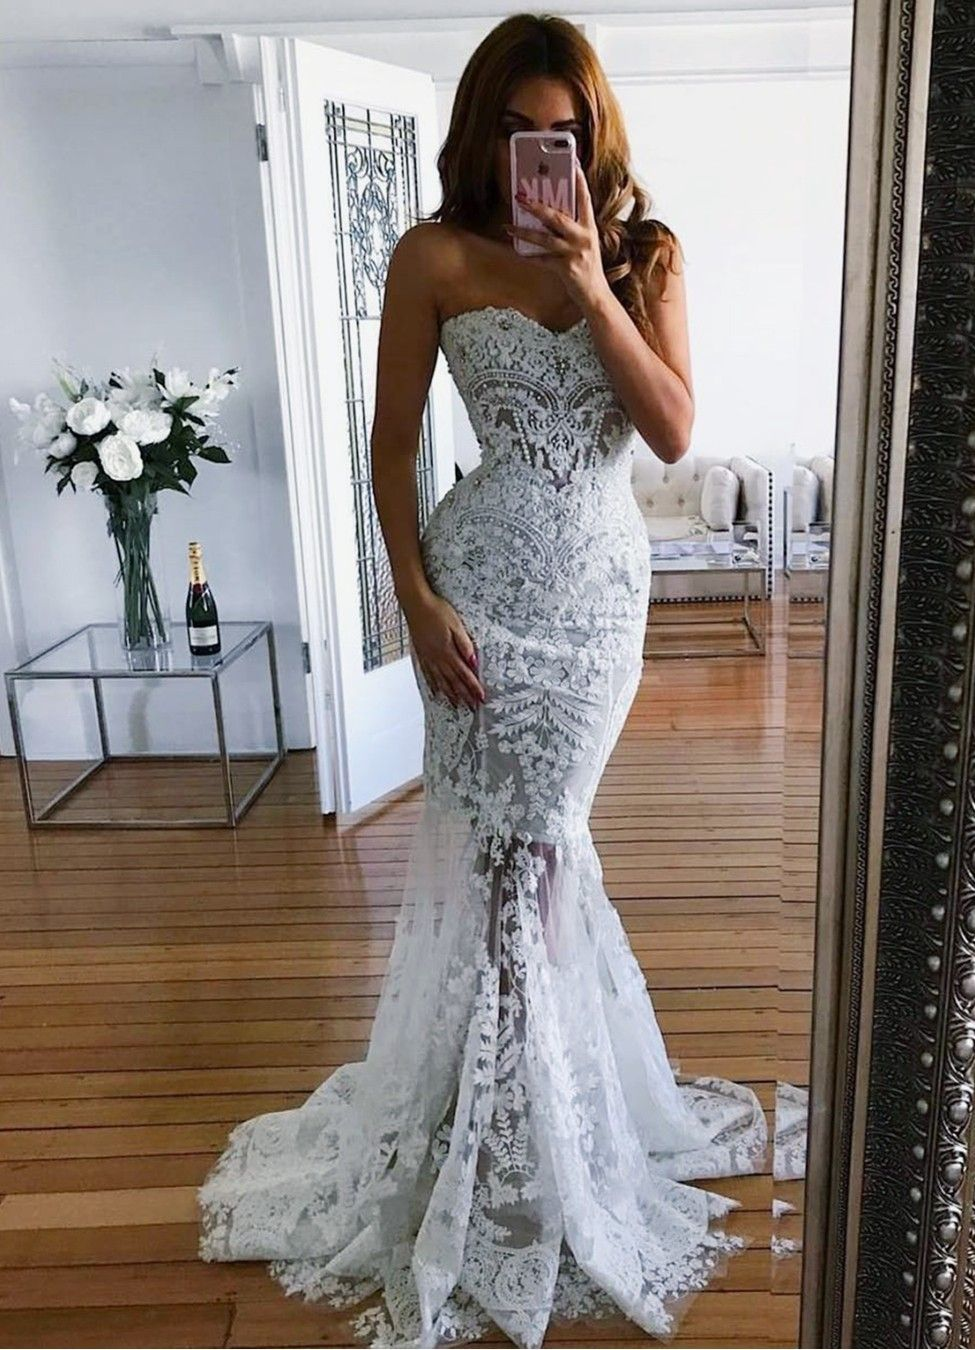 Pin By Shakira Vleij On Wedding Dress Dream Wedding Dresses Mermaid Wedding Dress Wedding Dresses [ 1350 x 975 Pixel ]